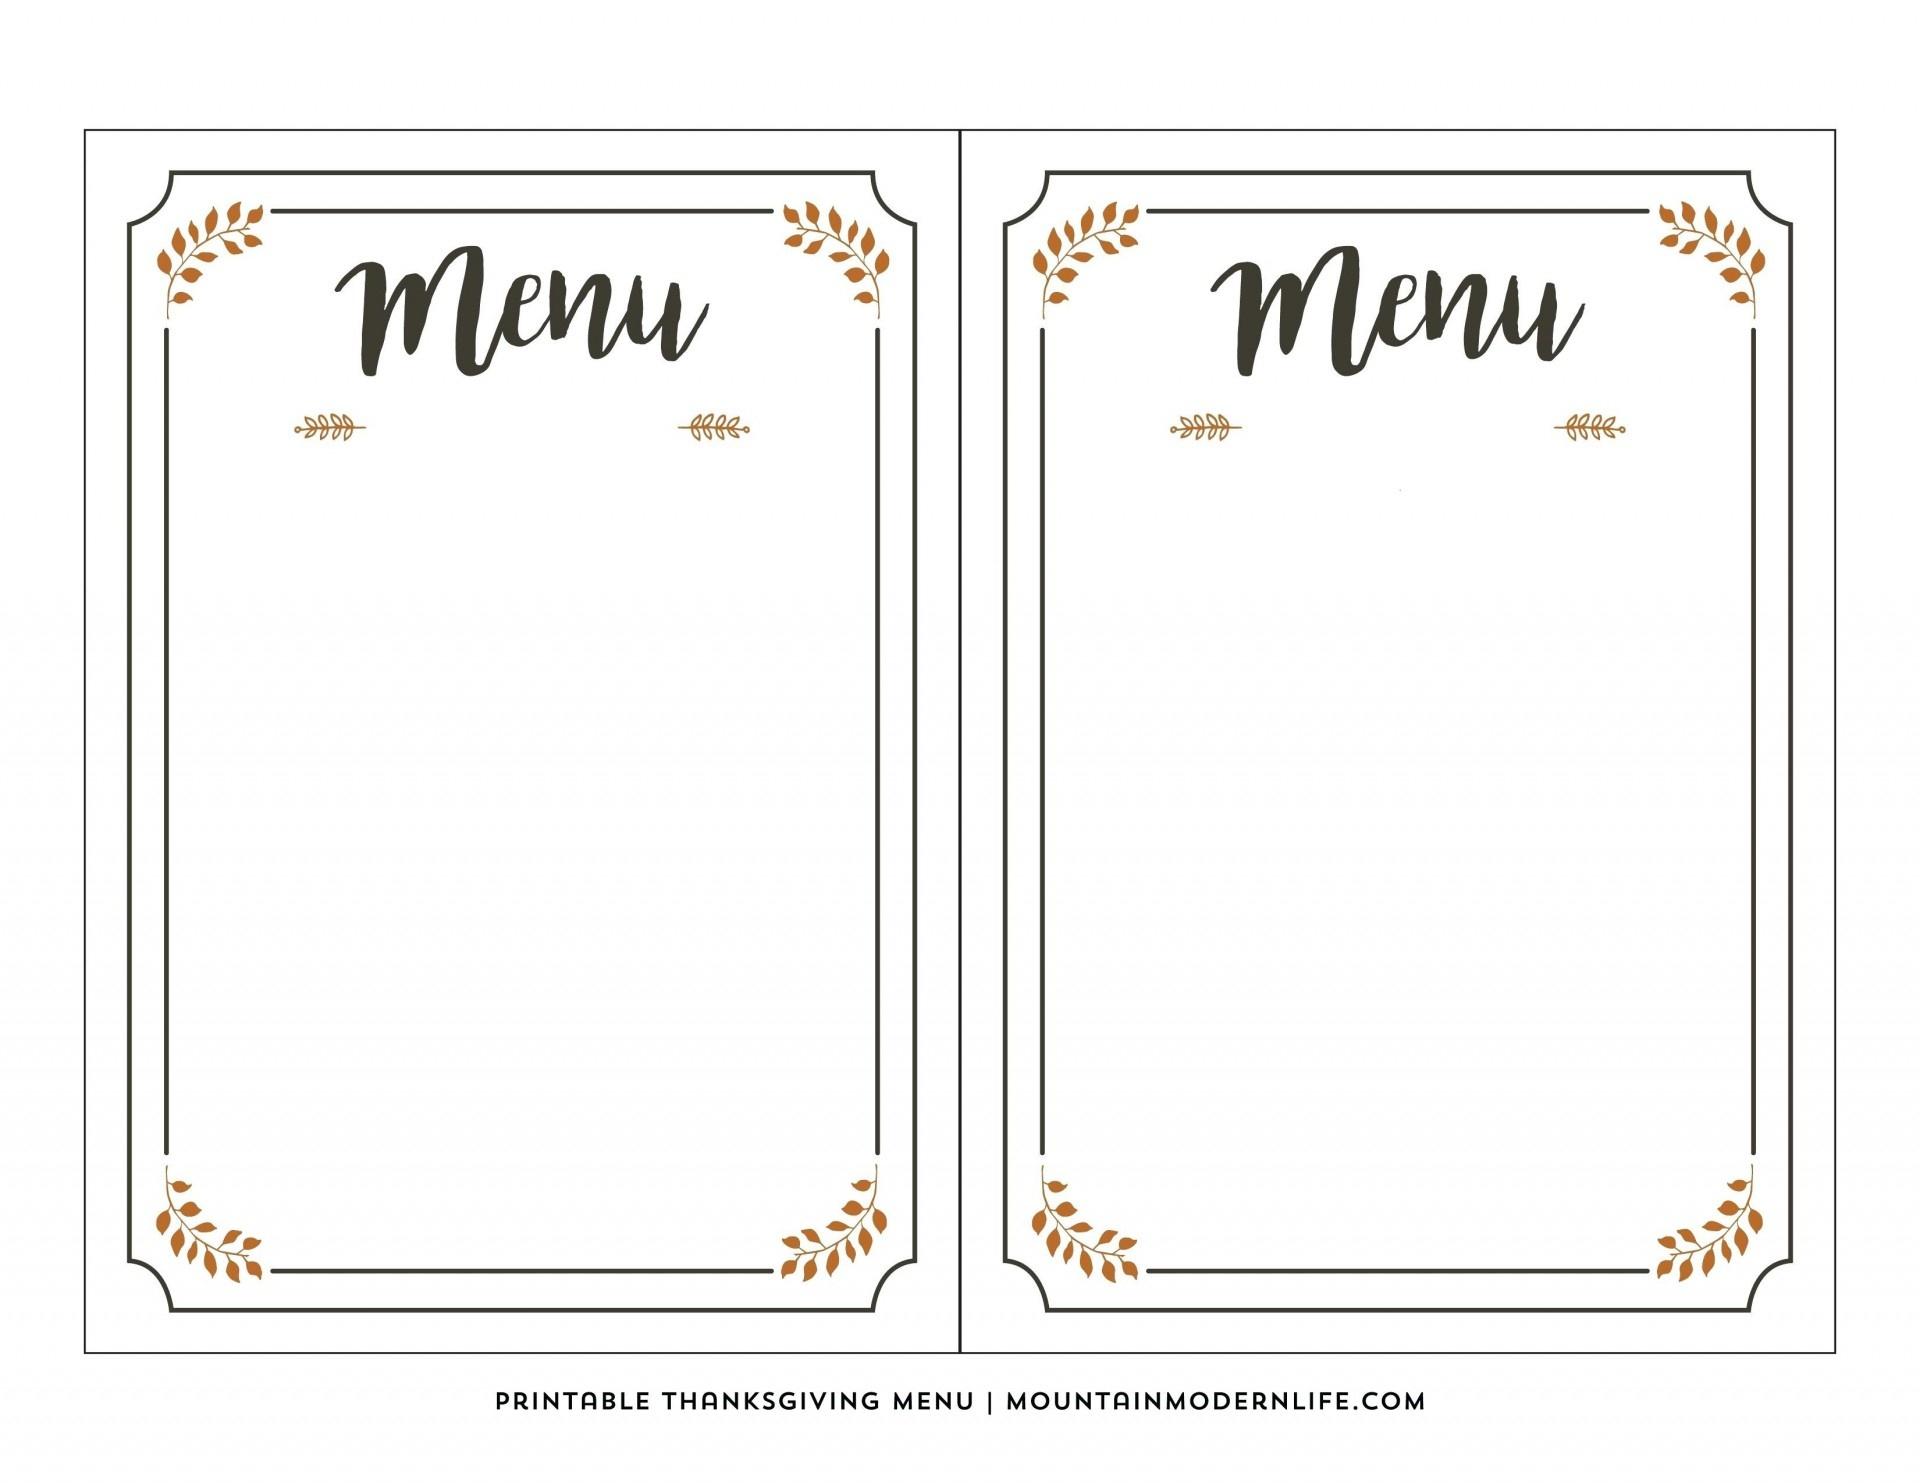 003 Free Printable Menu Template Templates For Kids New Awesome - Free Printable Menu